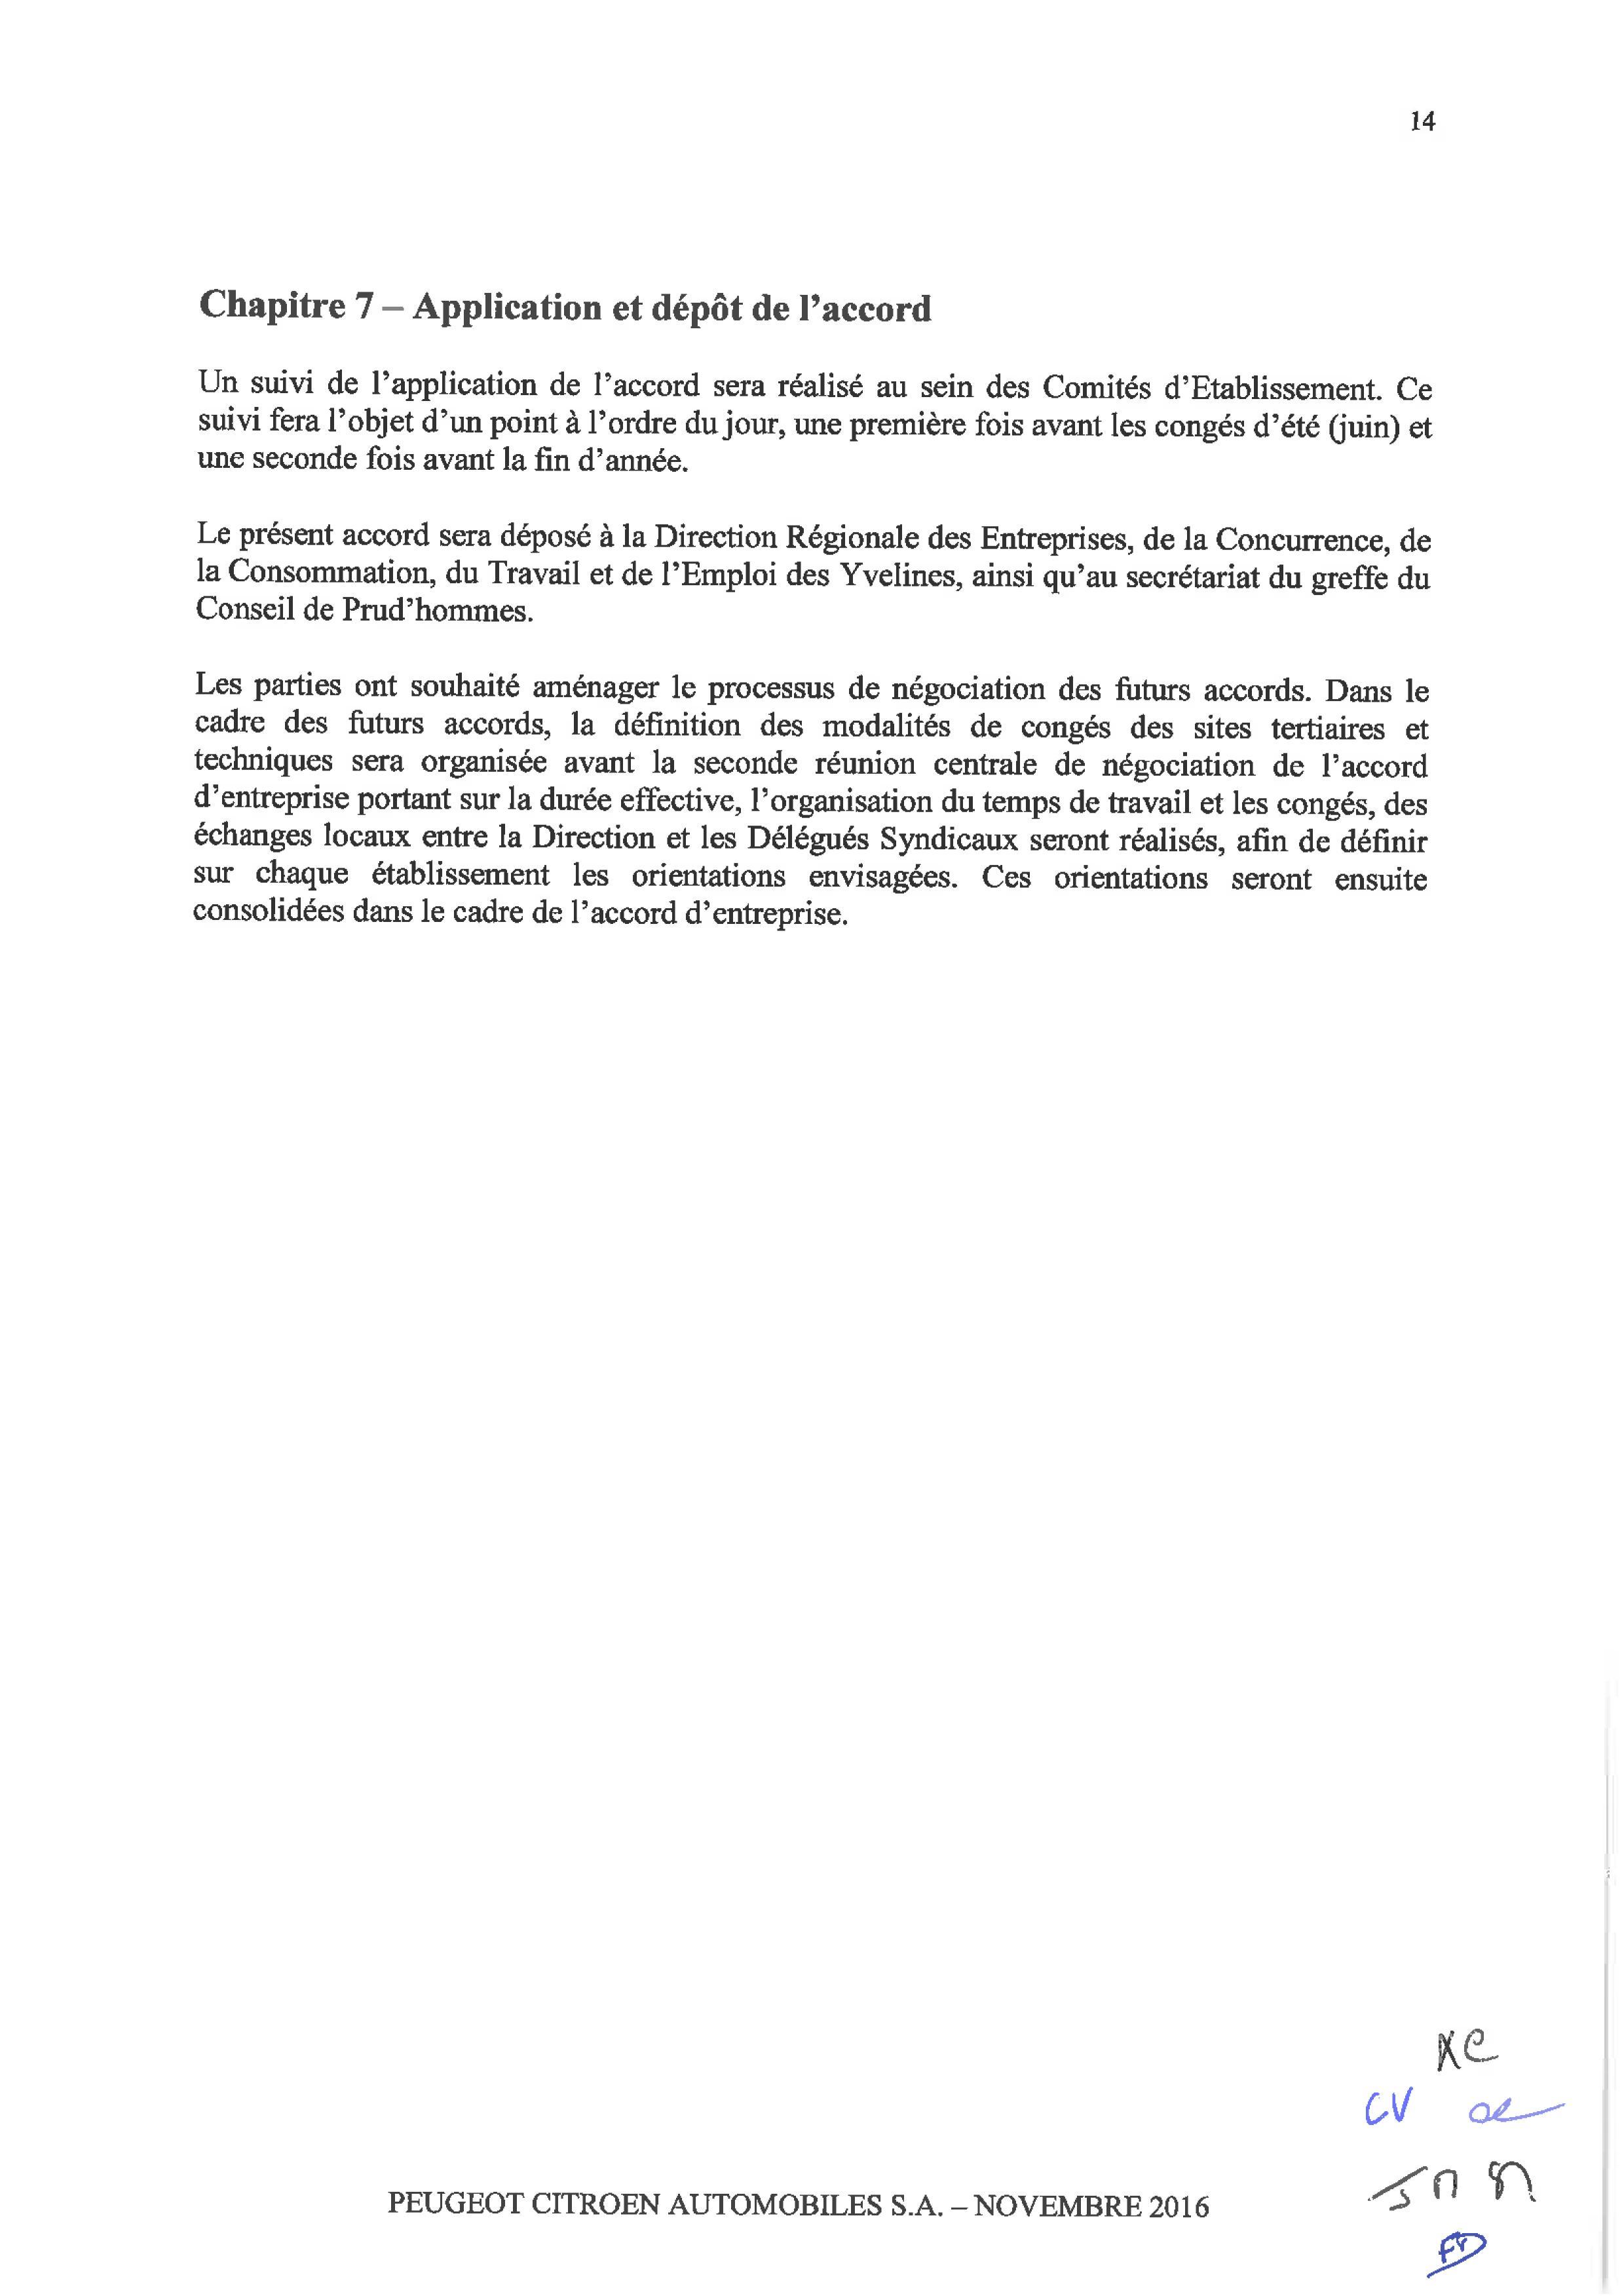 Accord centrale TT Congés_13